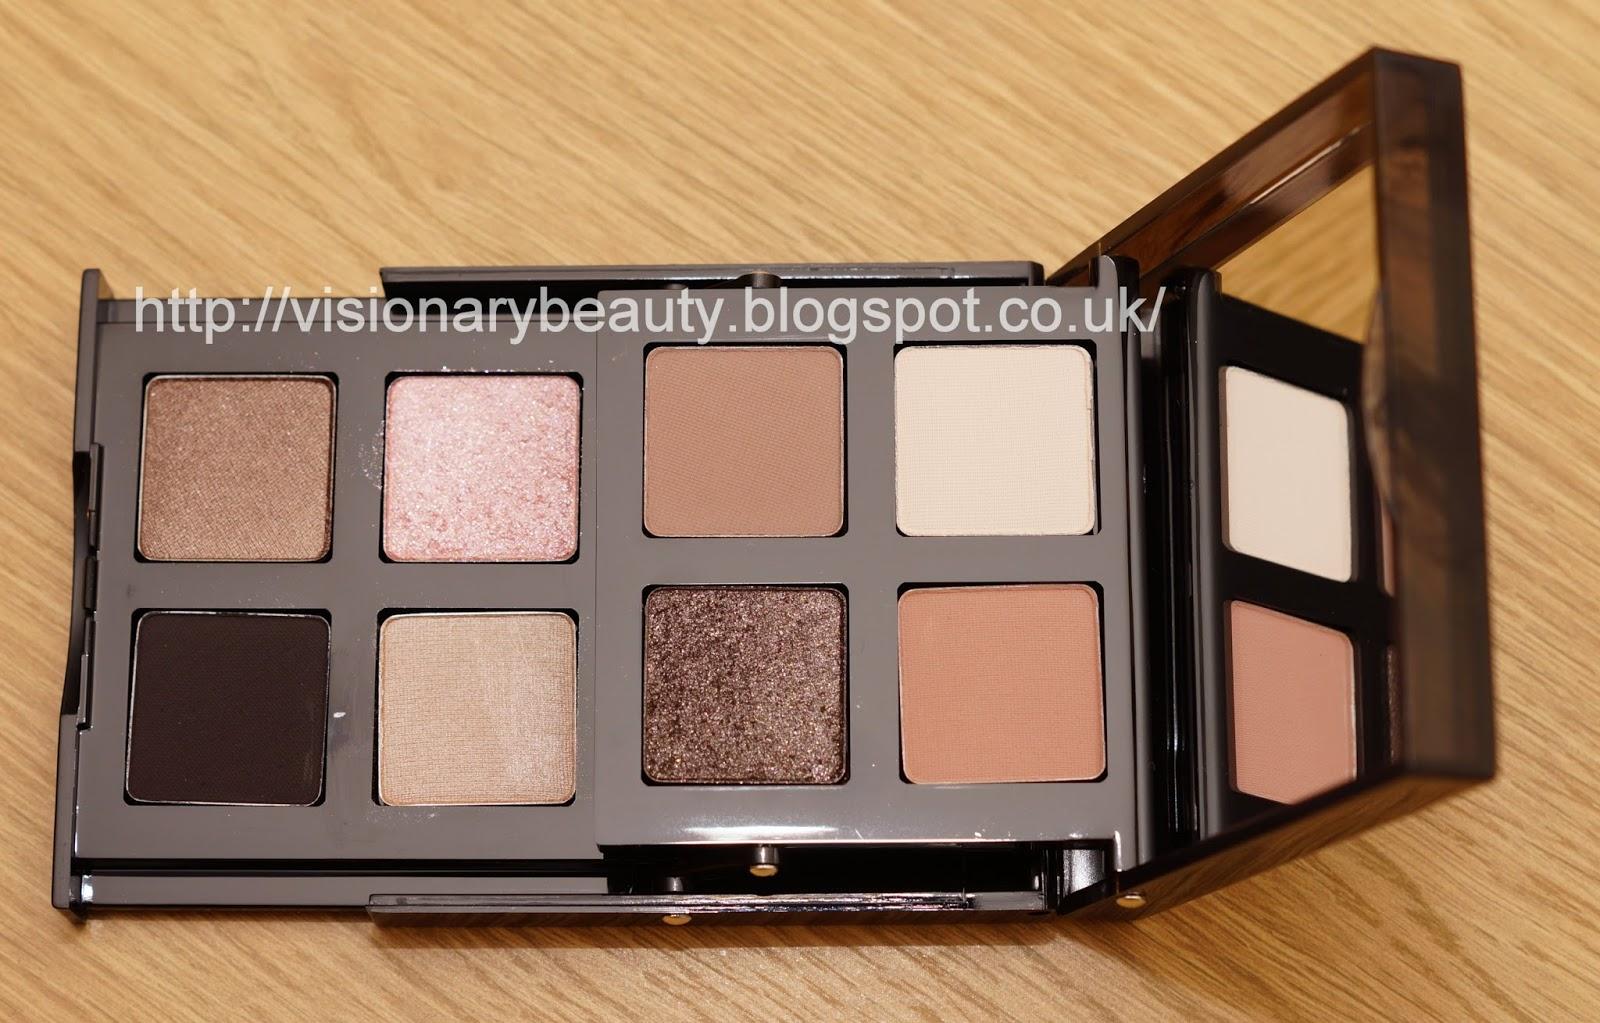 Visionary Beauty Bobbi Brown Fall 2014Smokey Nudes Eye